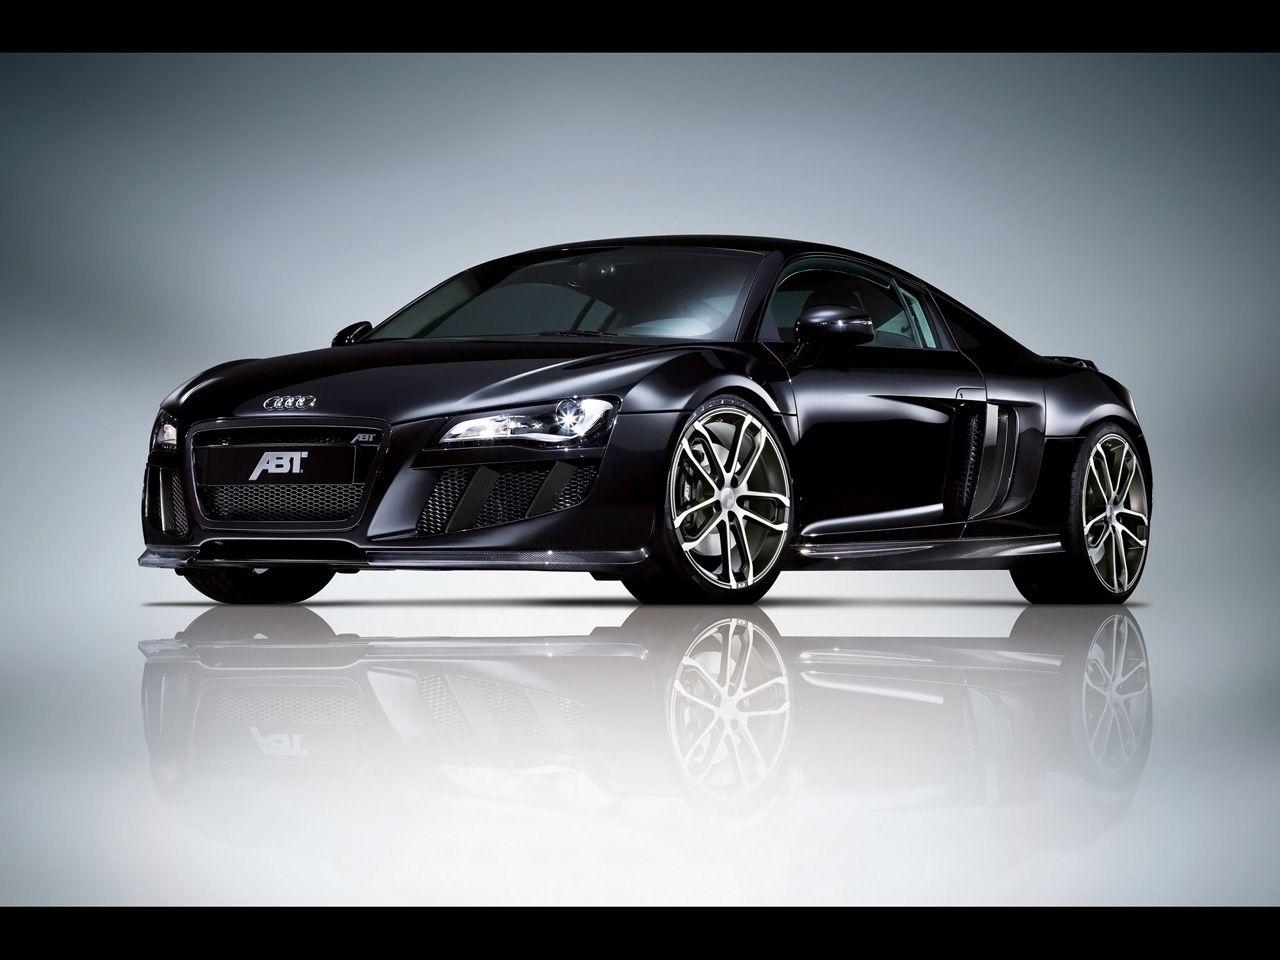 Genial Vehicle · 2010 Abt Audi R8 V10